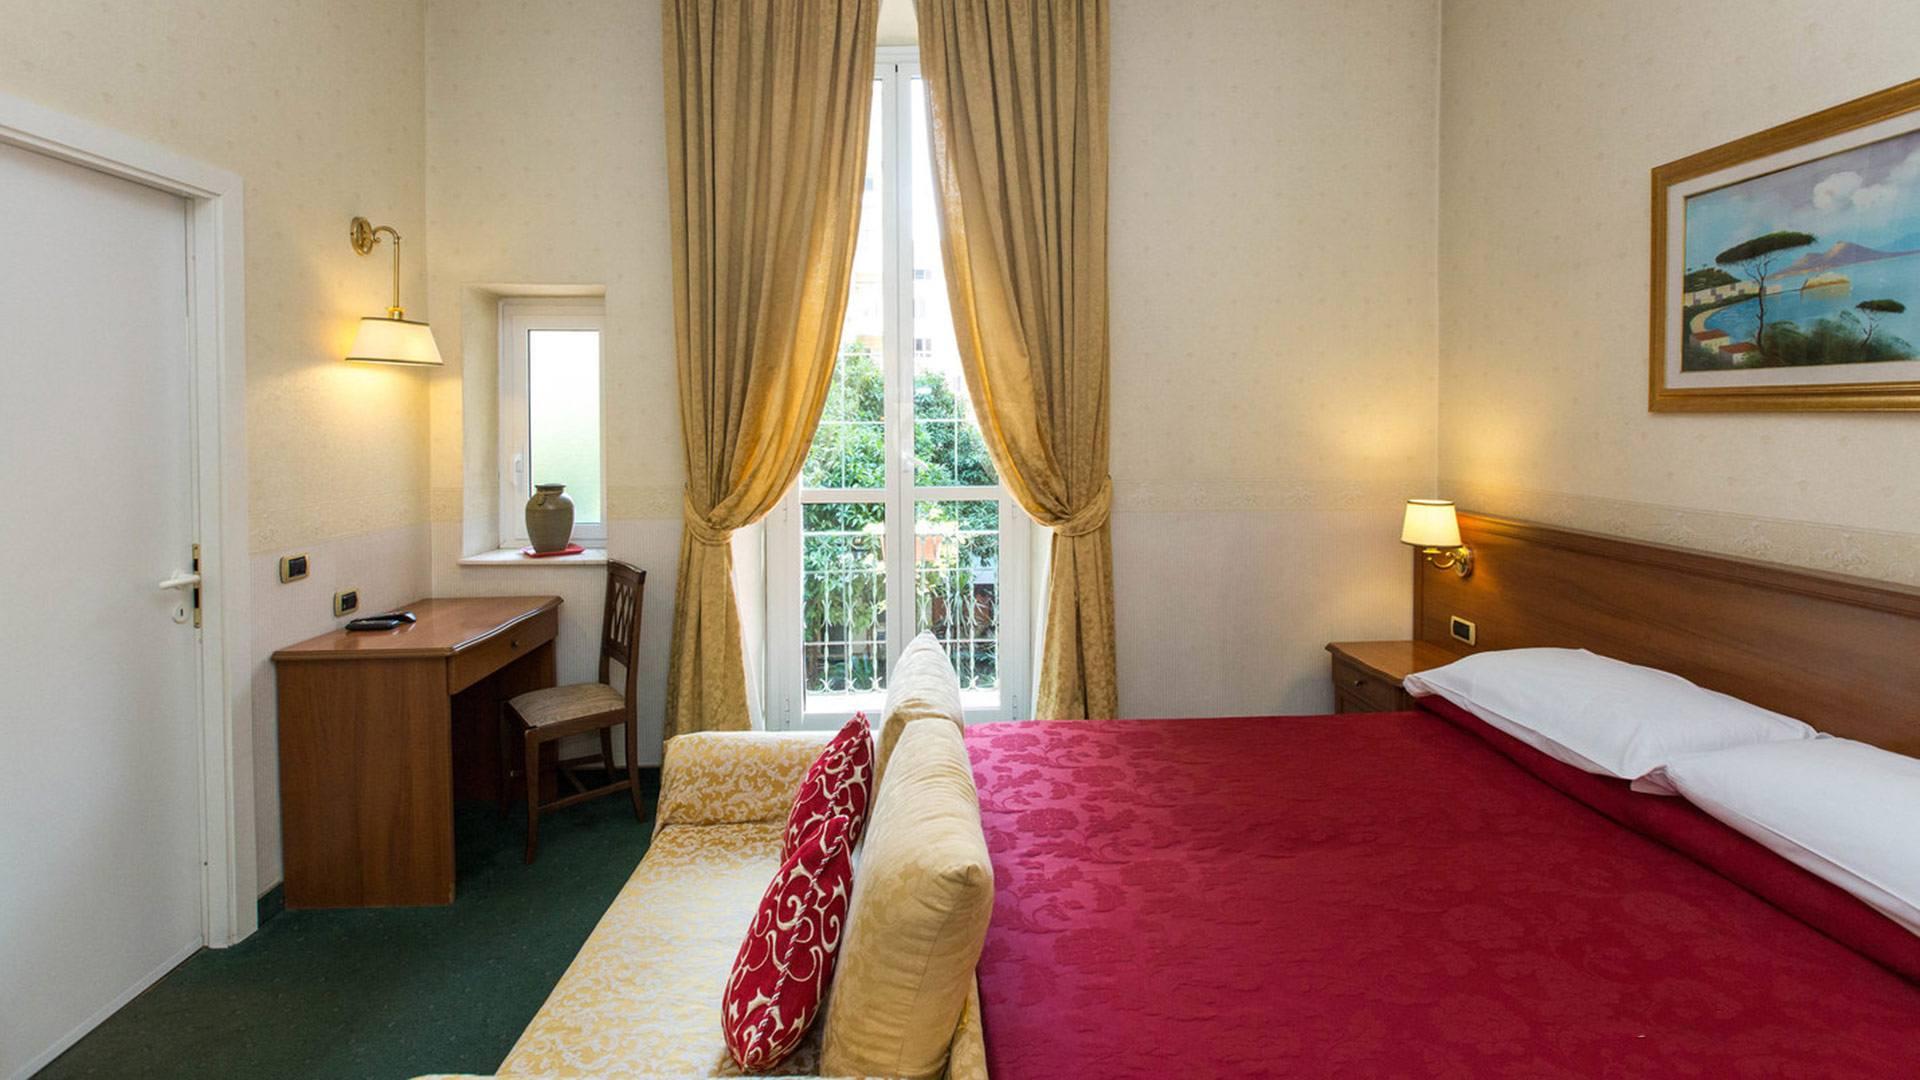 astoria garden hotel rome   official website   best rates guaranteed